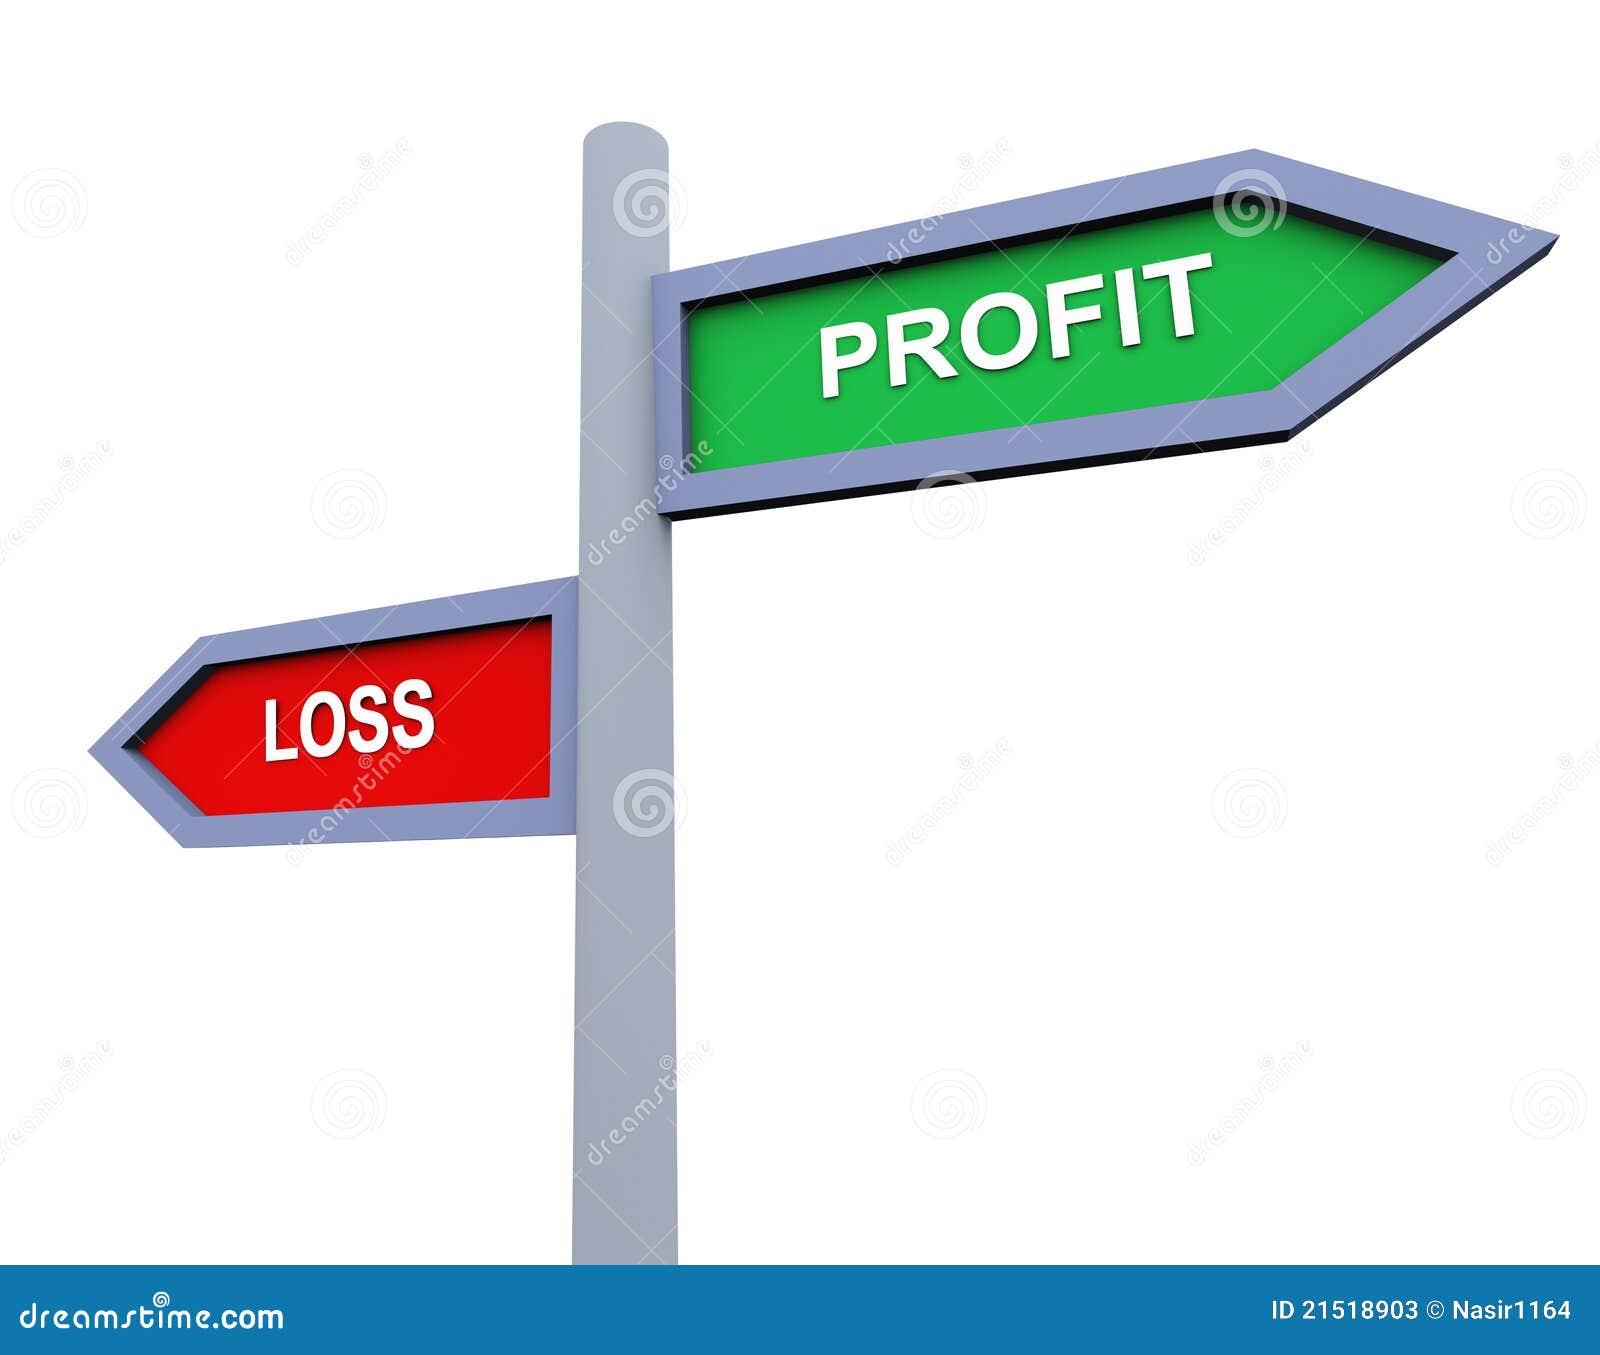 Profit: Profit And Loss Stock Photos